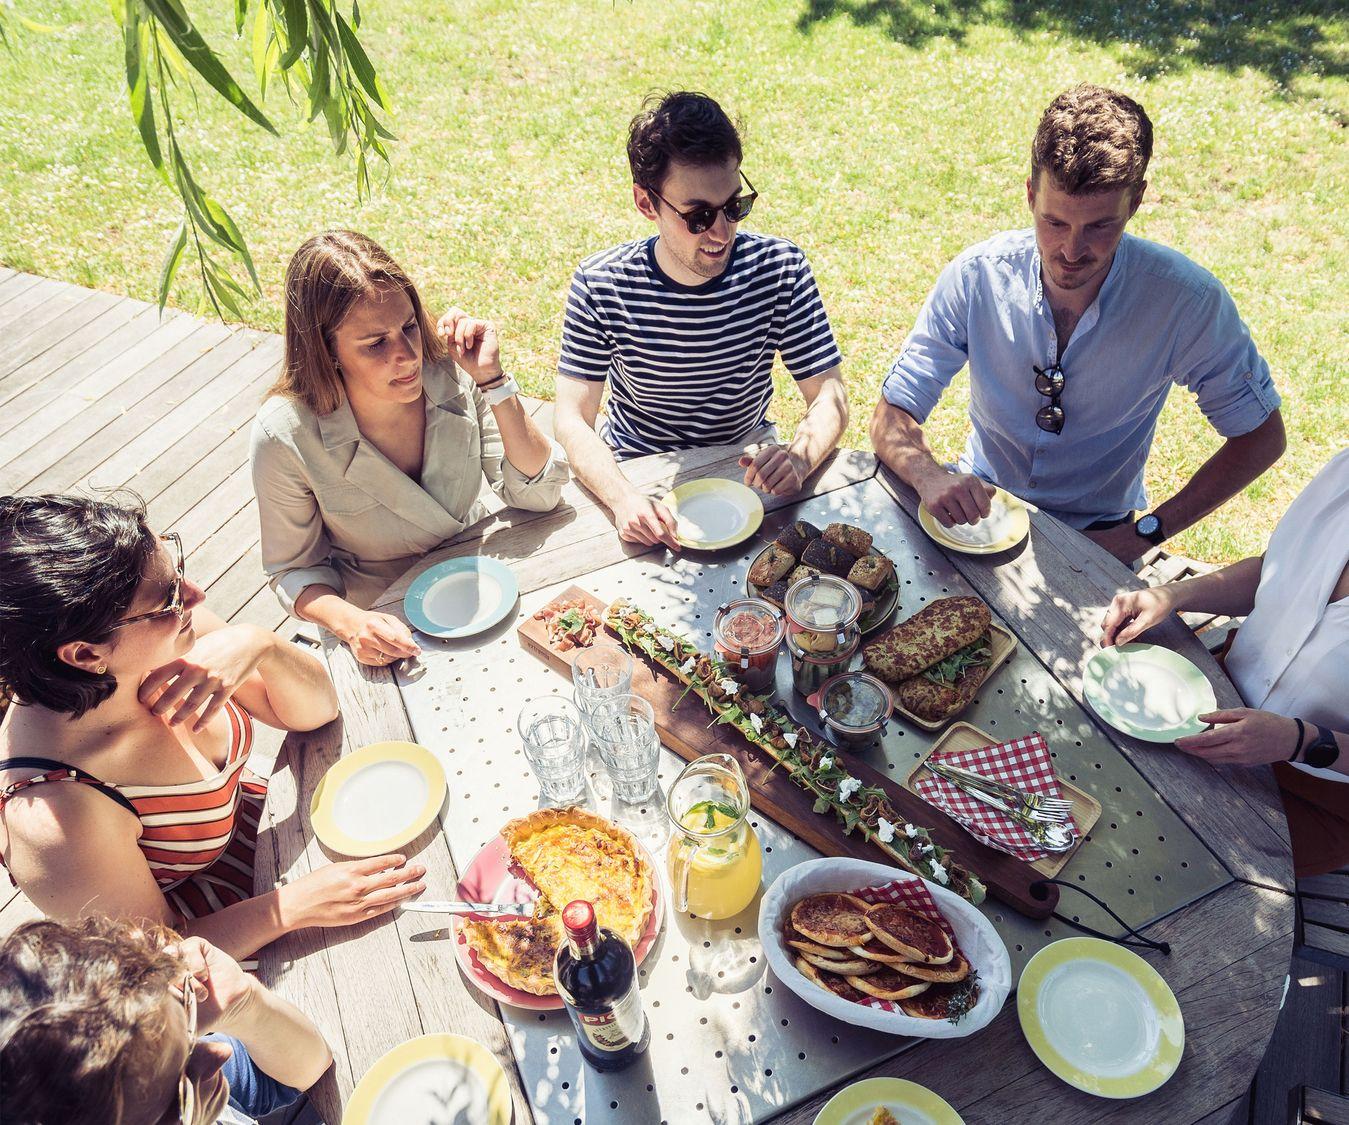 International-picnic-day